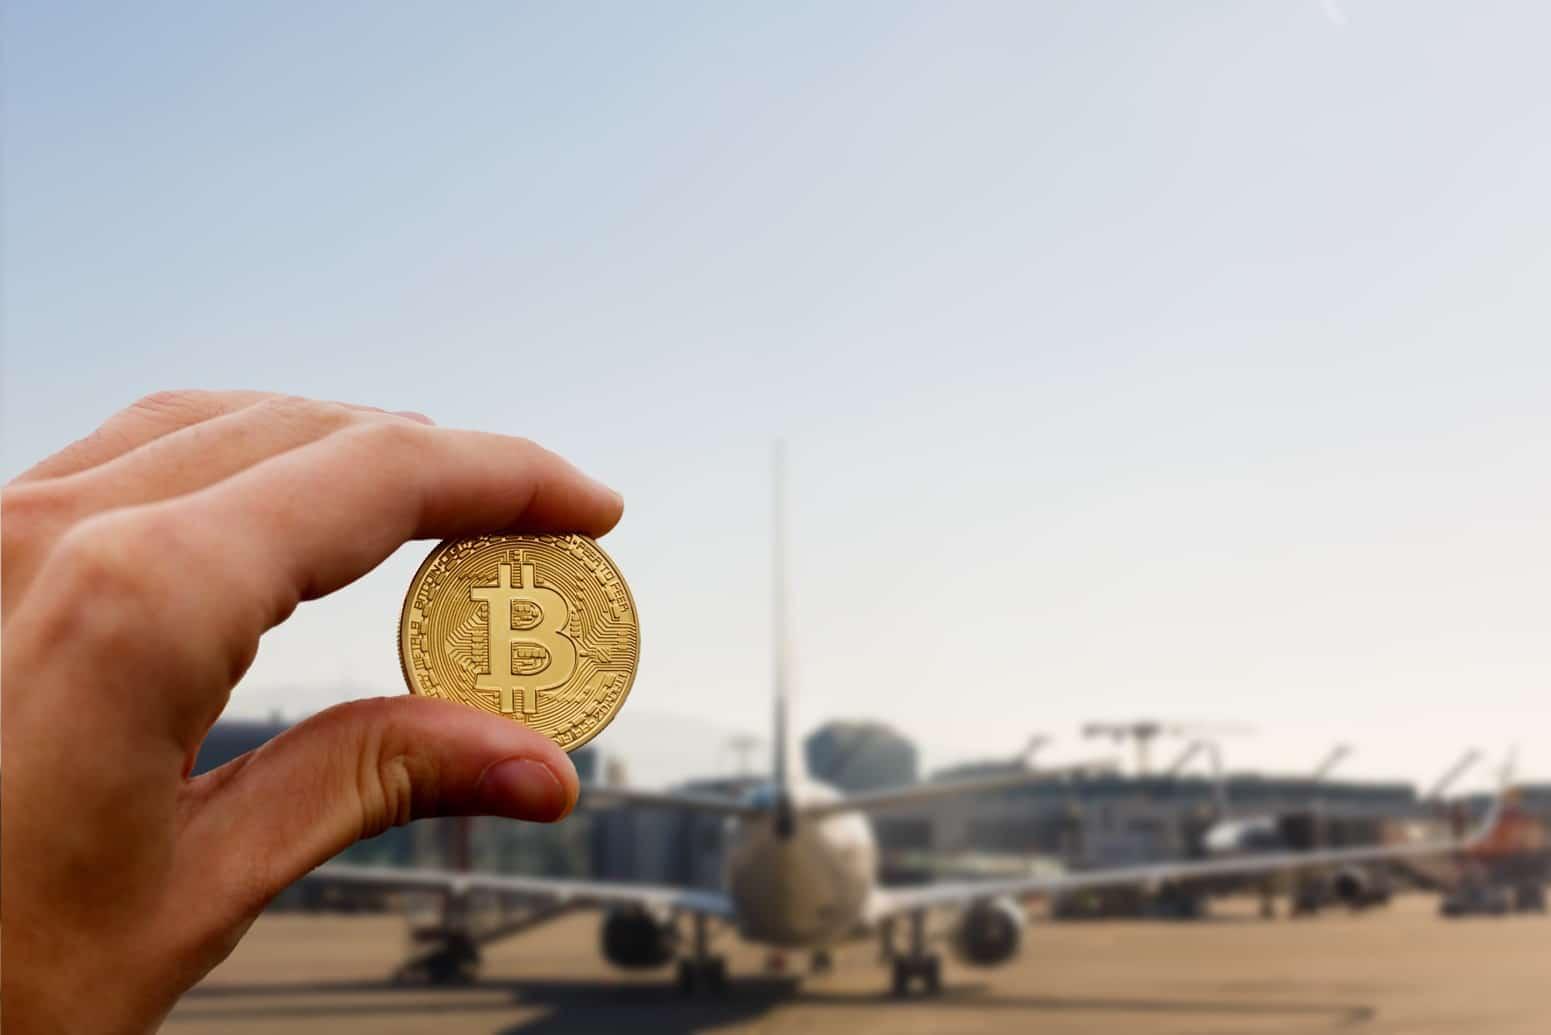 travelbybit-australia-criptomonedas-vuelos